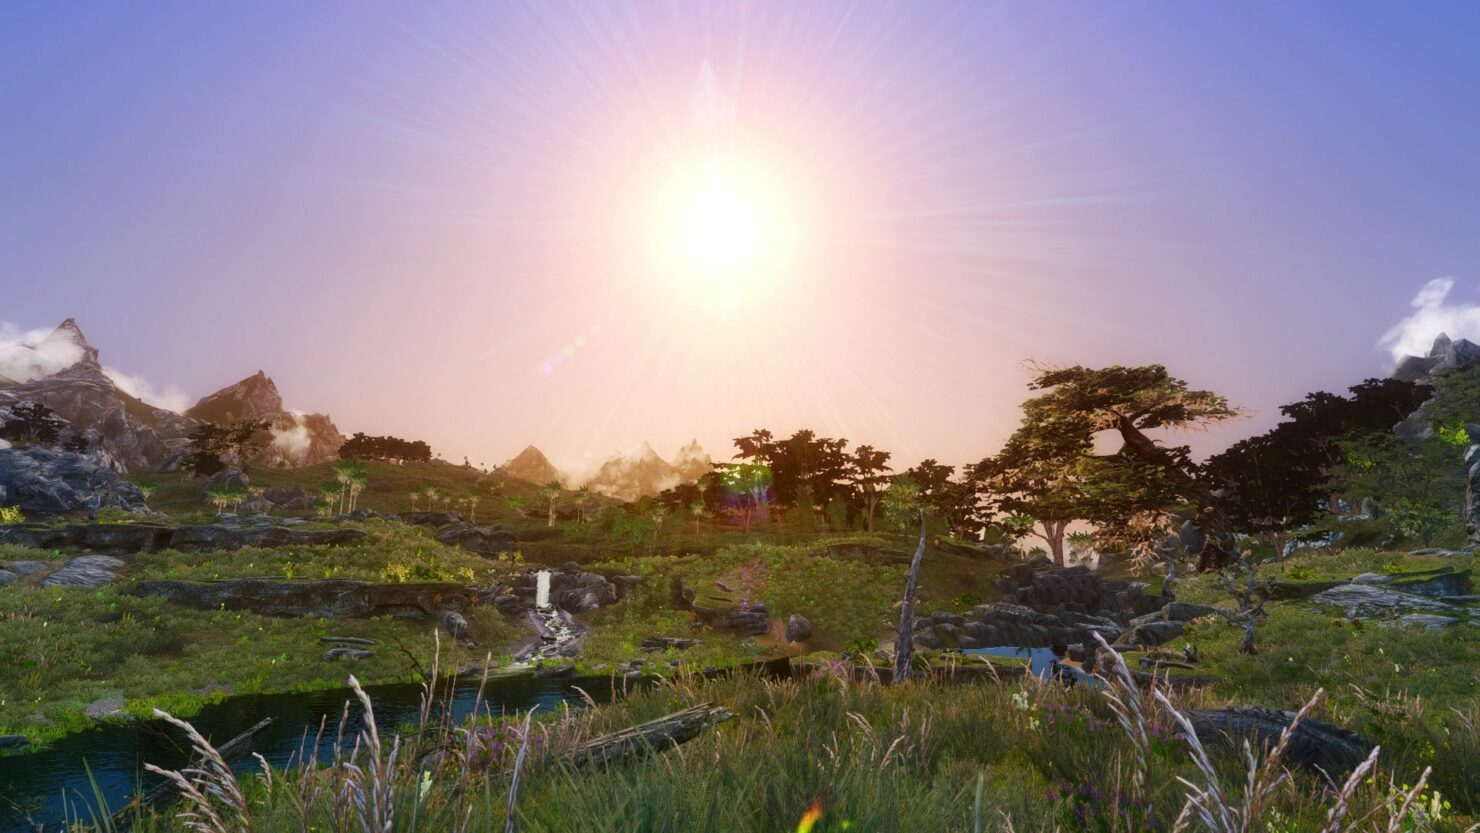 elder-scrolls-v-skyrim-legendary-edition-project-rainforest-mod-update-6